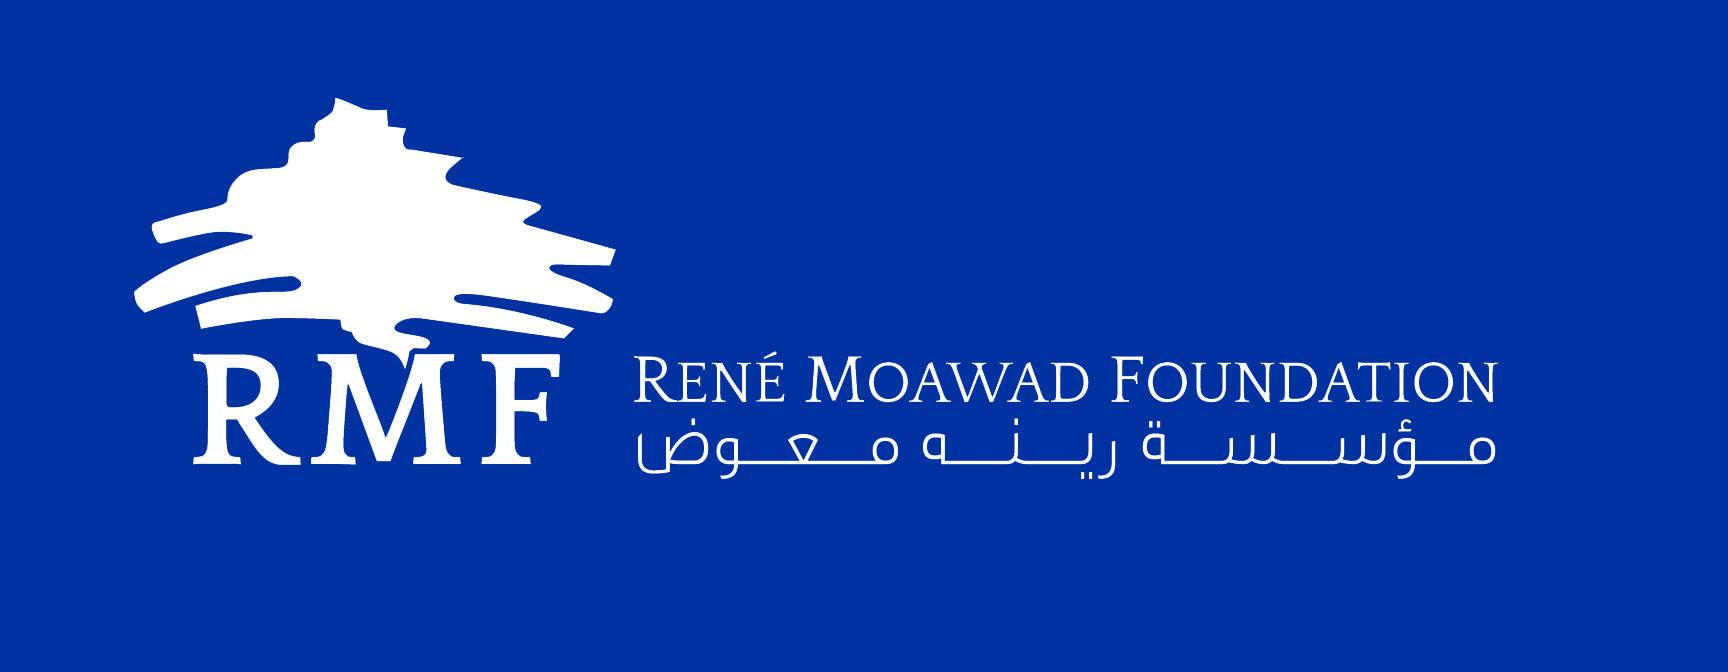 RMF-logo-white